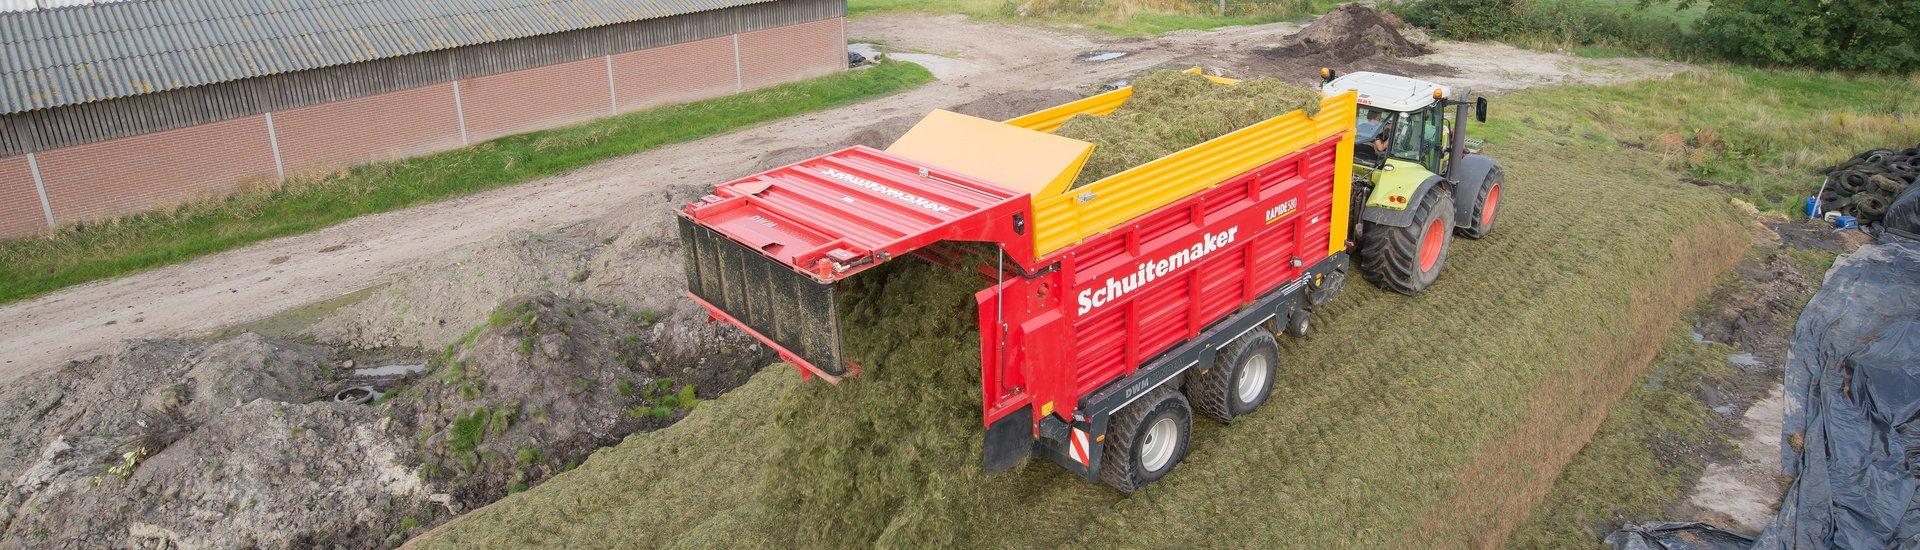 Schuitemaker Rapide Fütternwagen